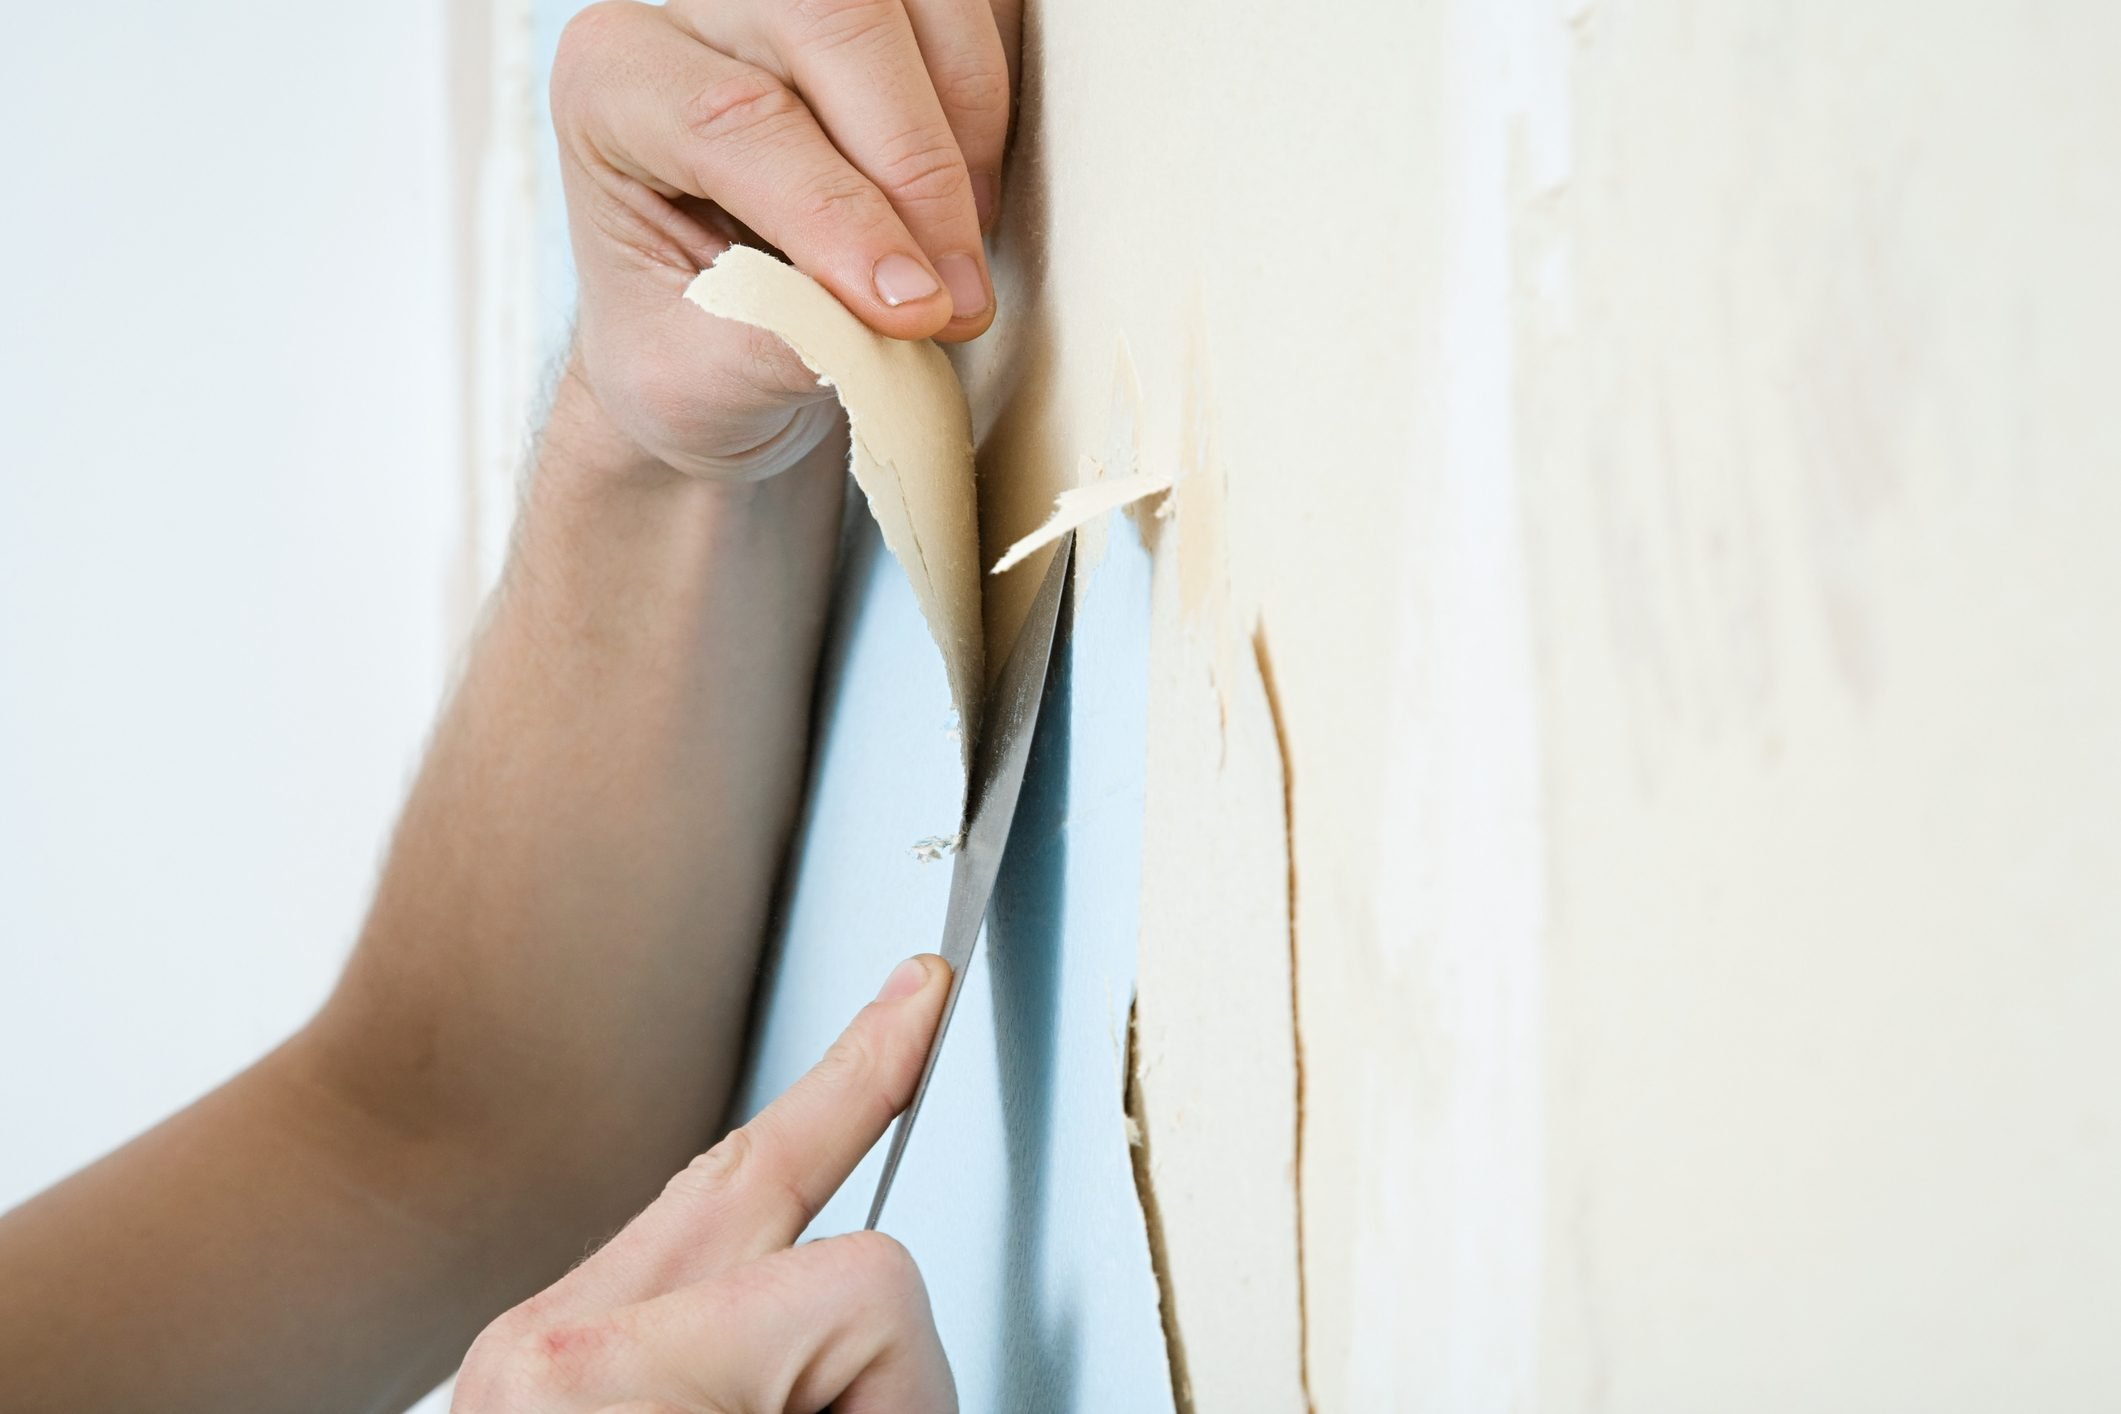 Person removing wallpaper